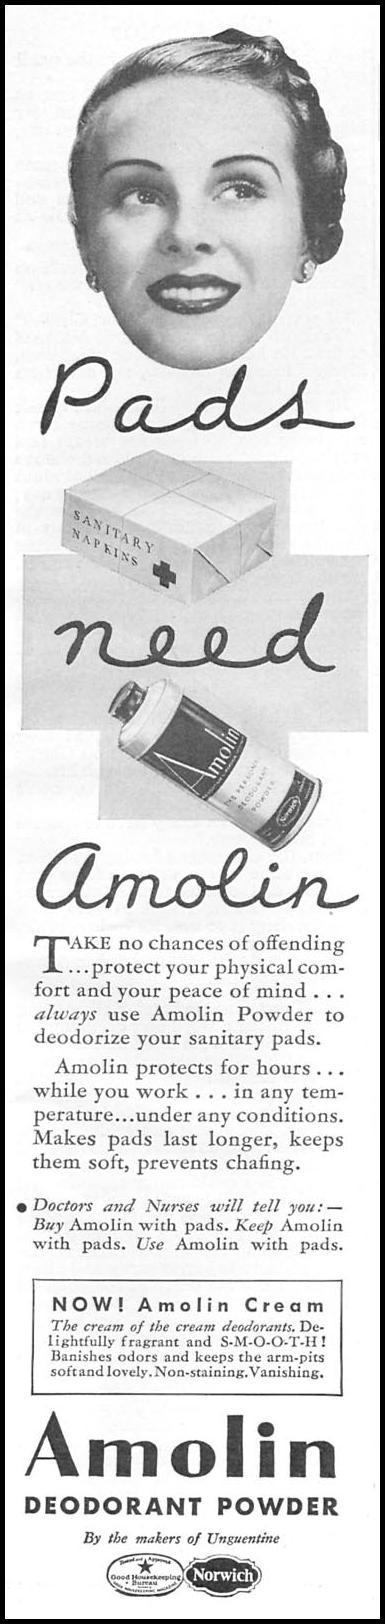 AMOLIN DEODORANT POWDER GOOD HOUSEKEEPING 04/01/1936 p. 211